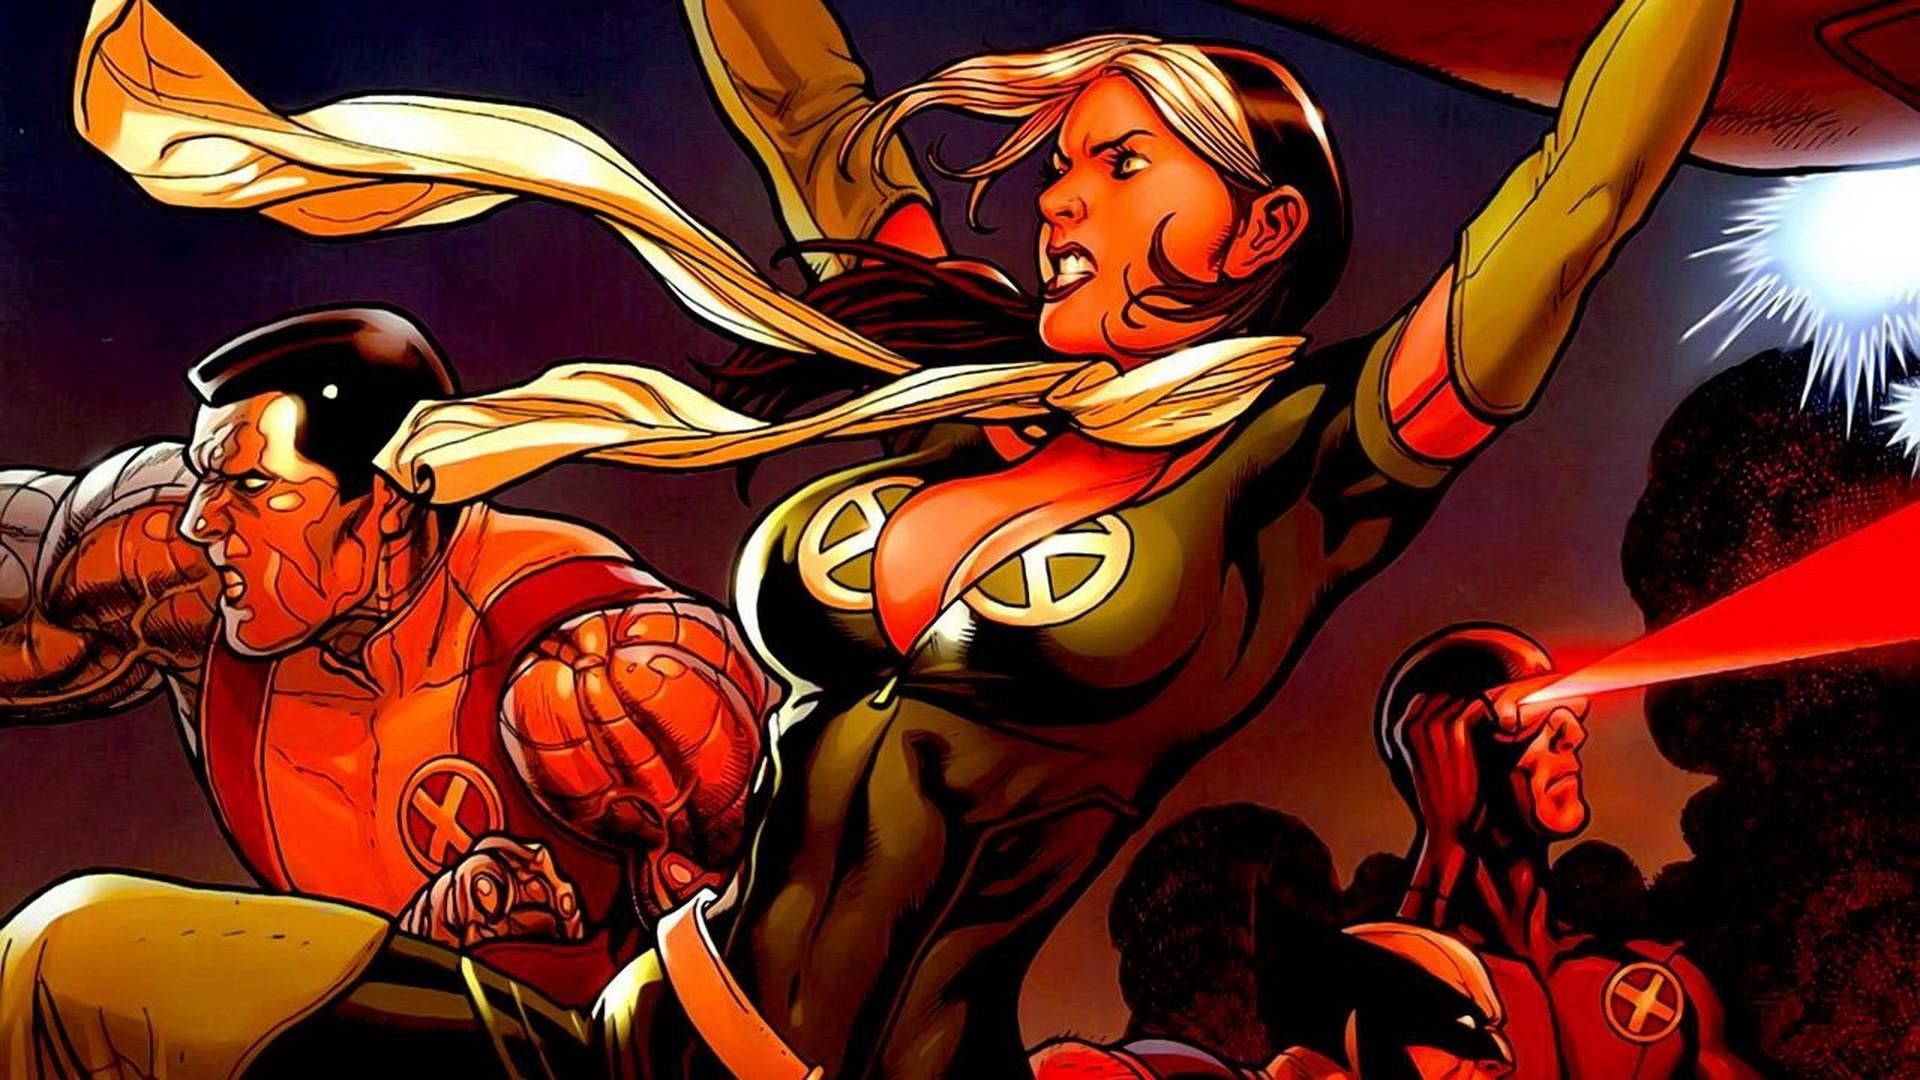 1920x1080 Px Comics Cyclops Marvel Rogue Character Wolverine X Men